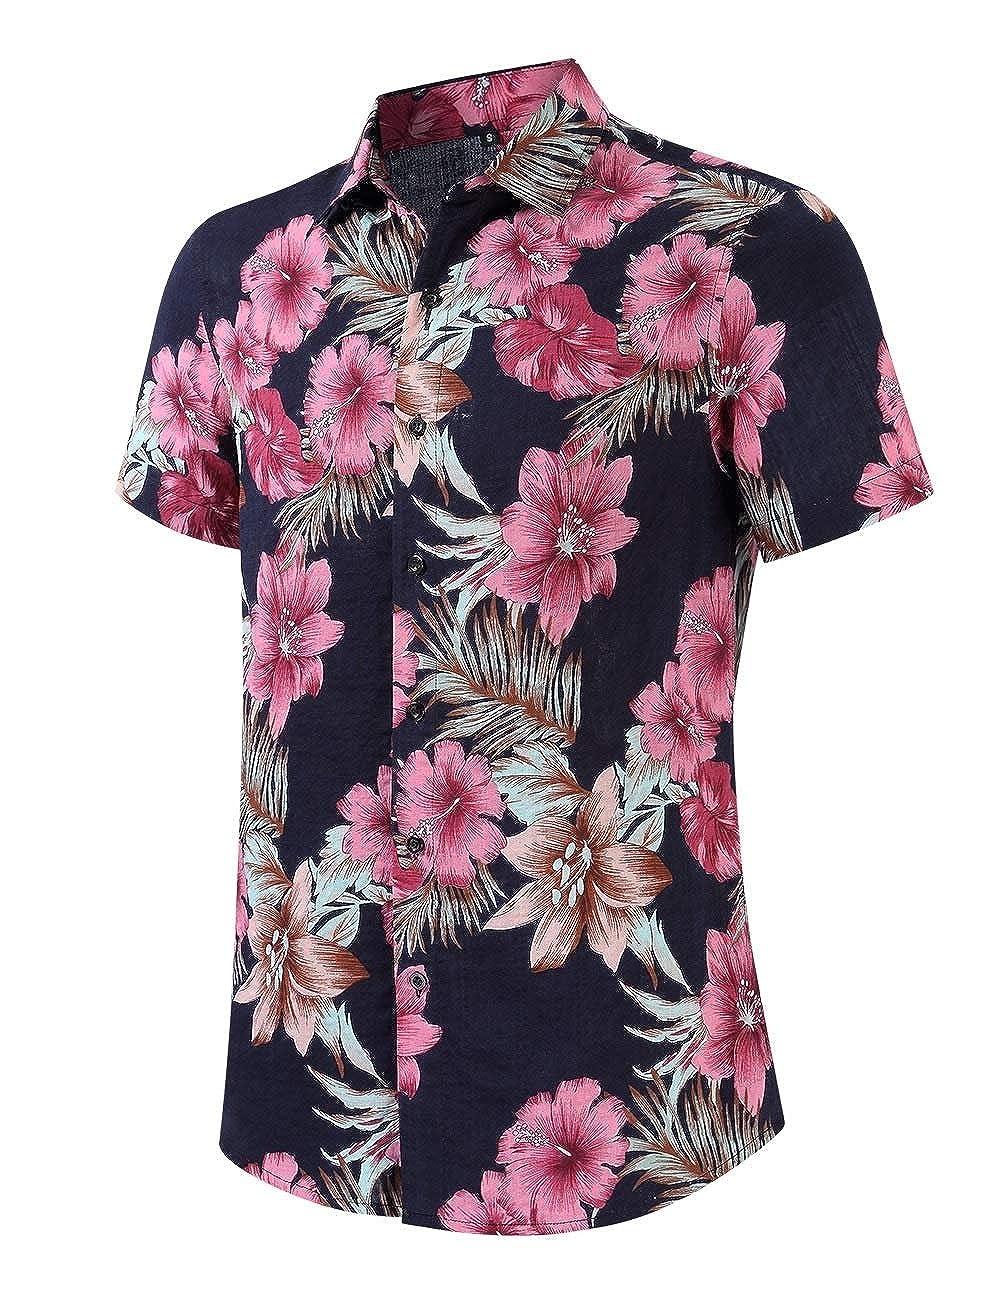 VividYouMen Leisure Relaxed-Fit Beach Hawaiian Boho Short-Sleeve Business Shirts